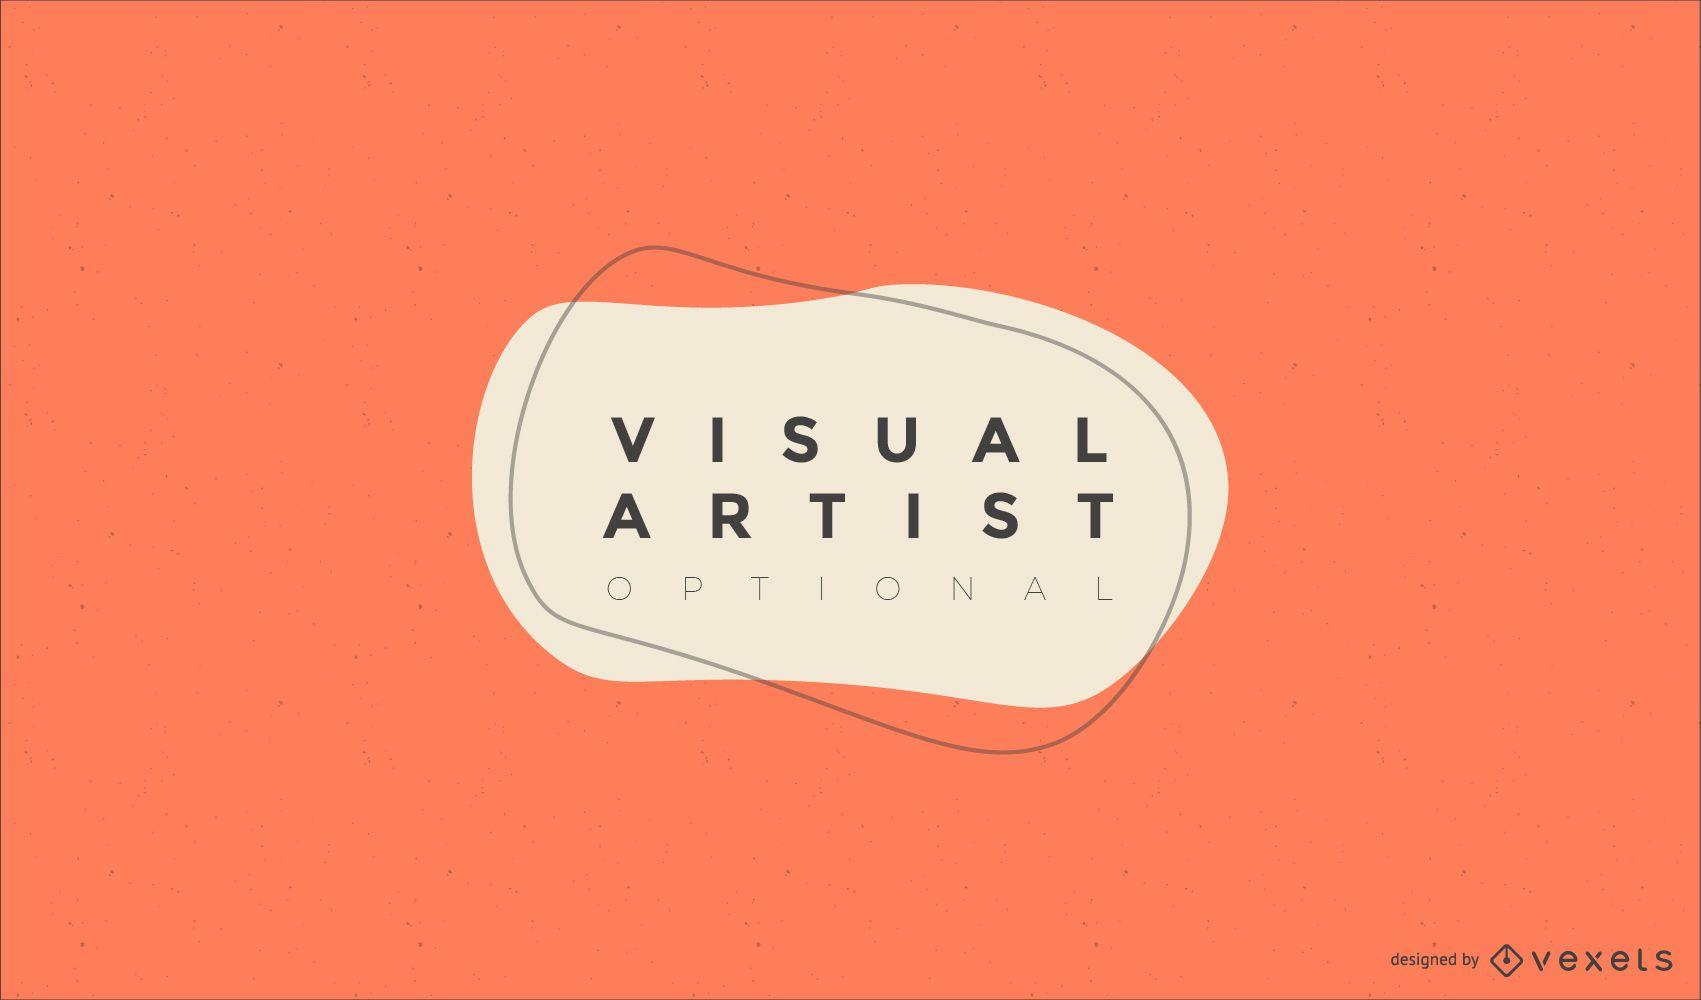 Visual artist logo design